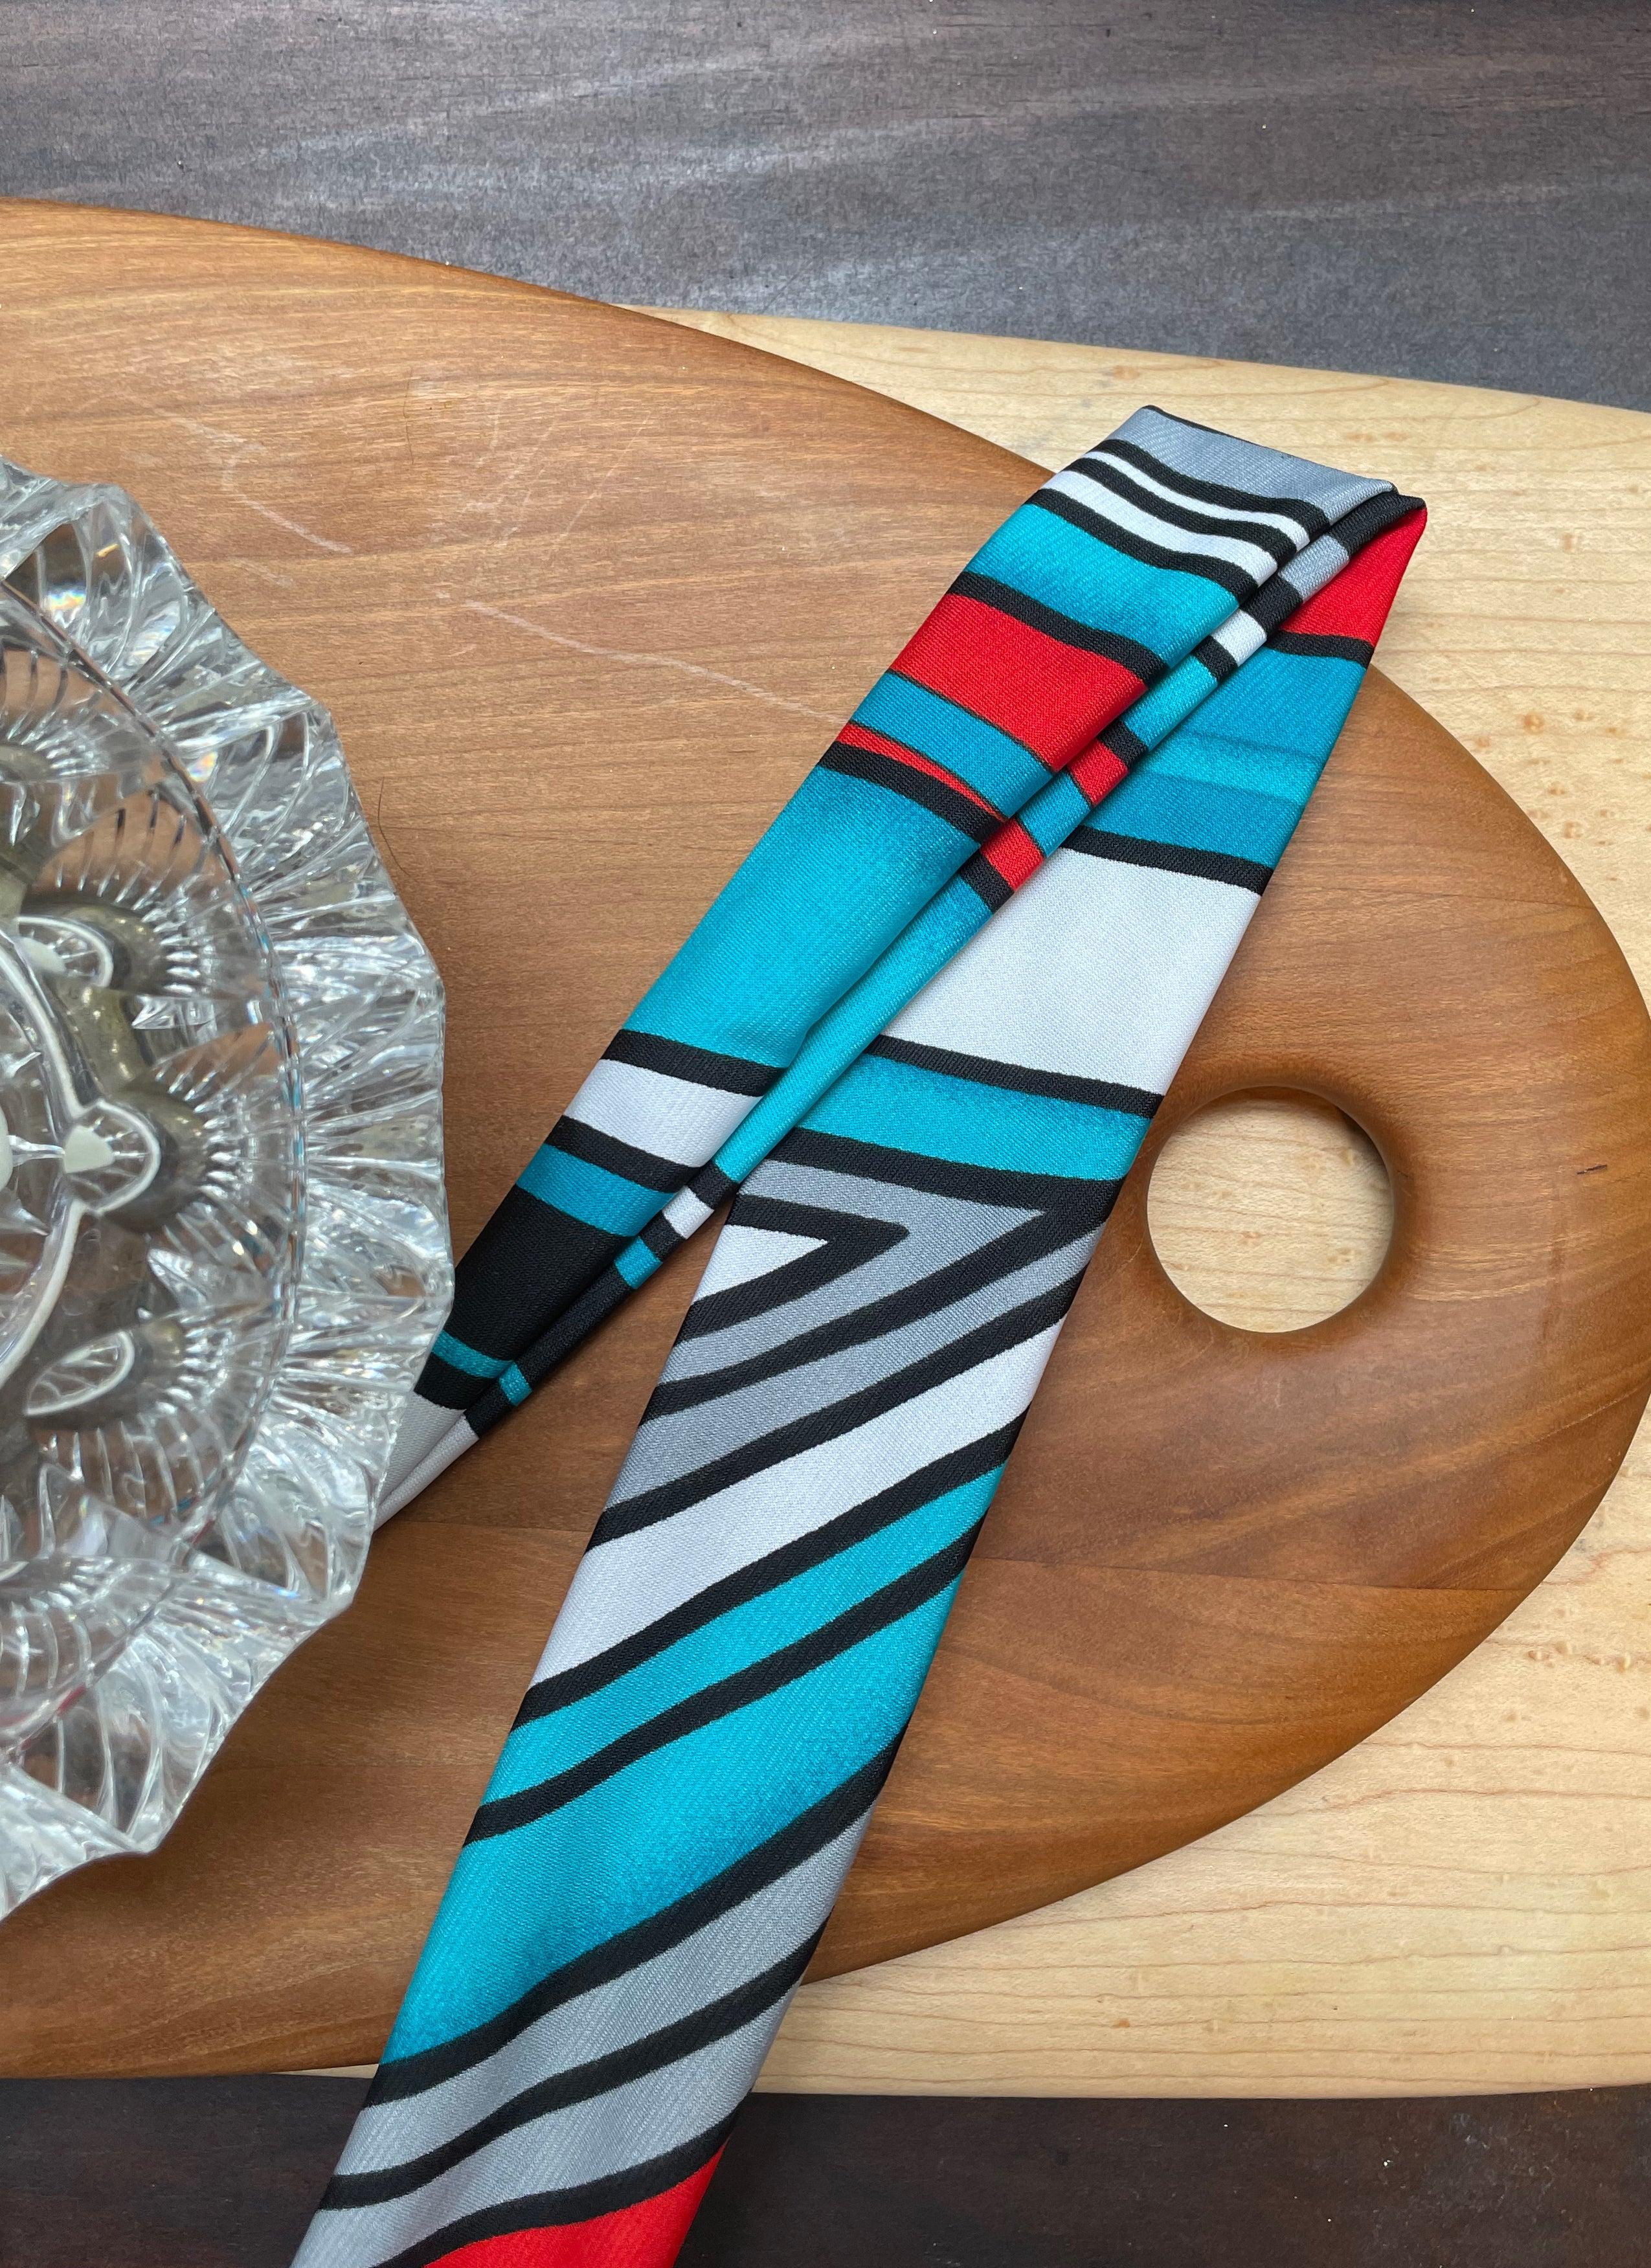 tie - psychedelic swirls